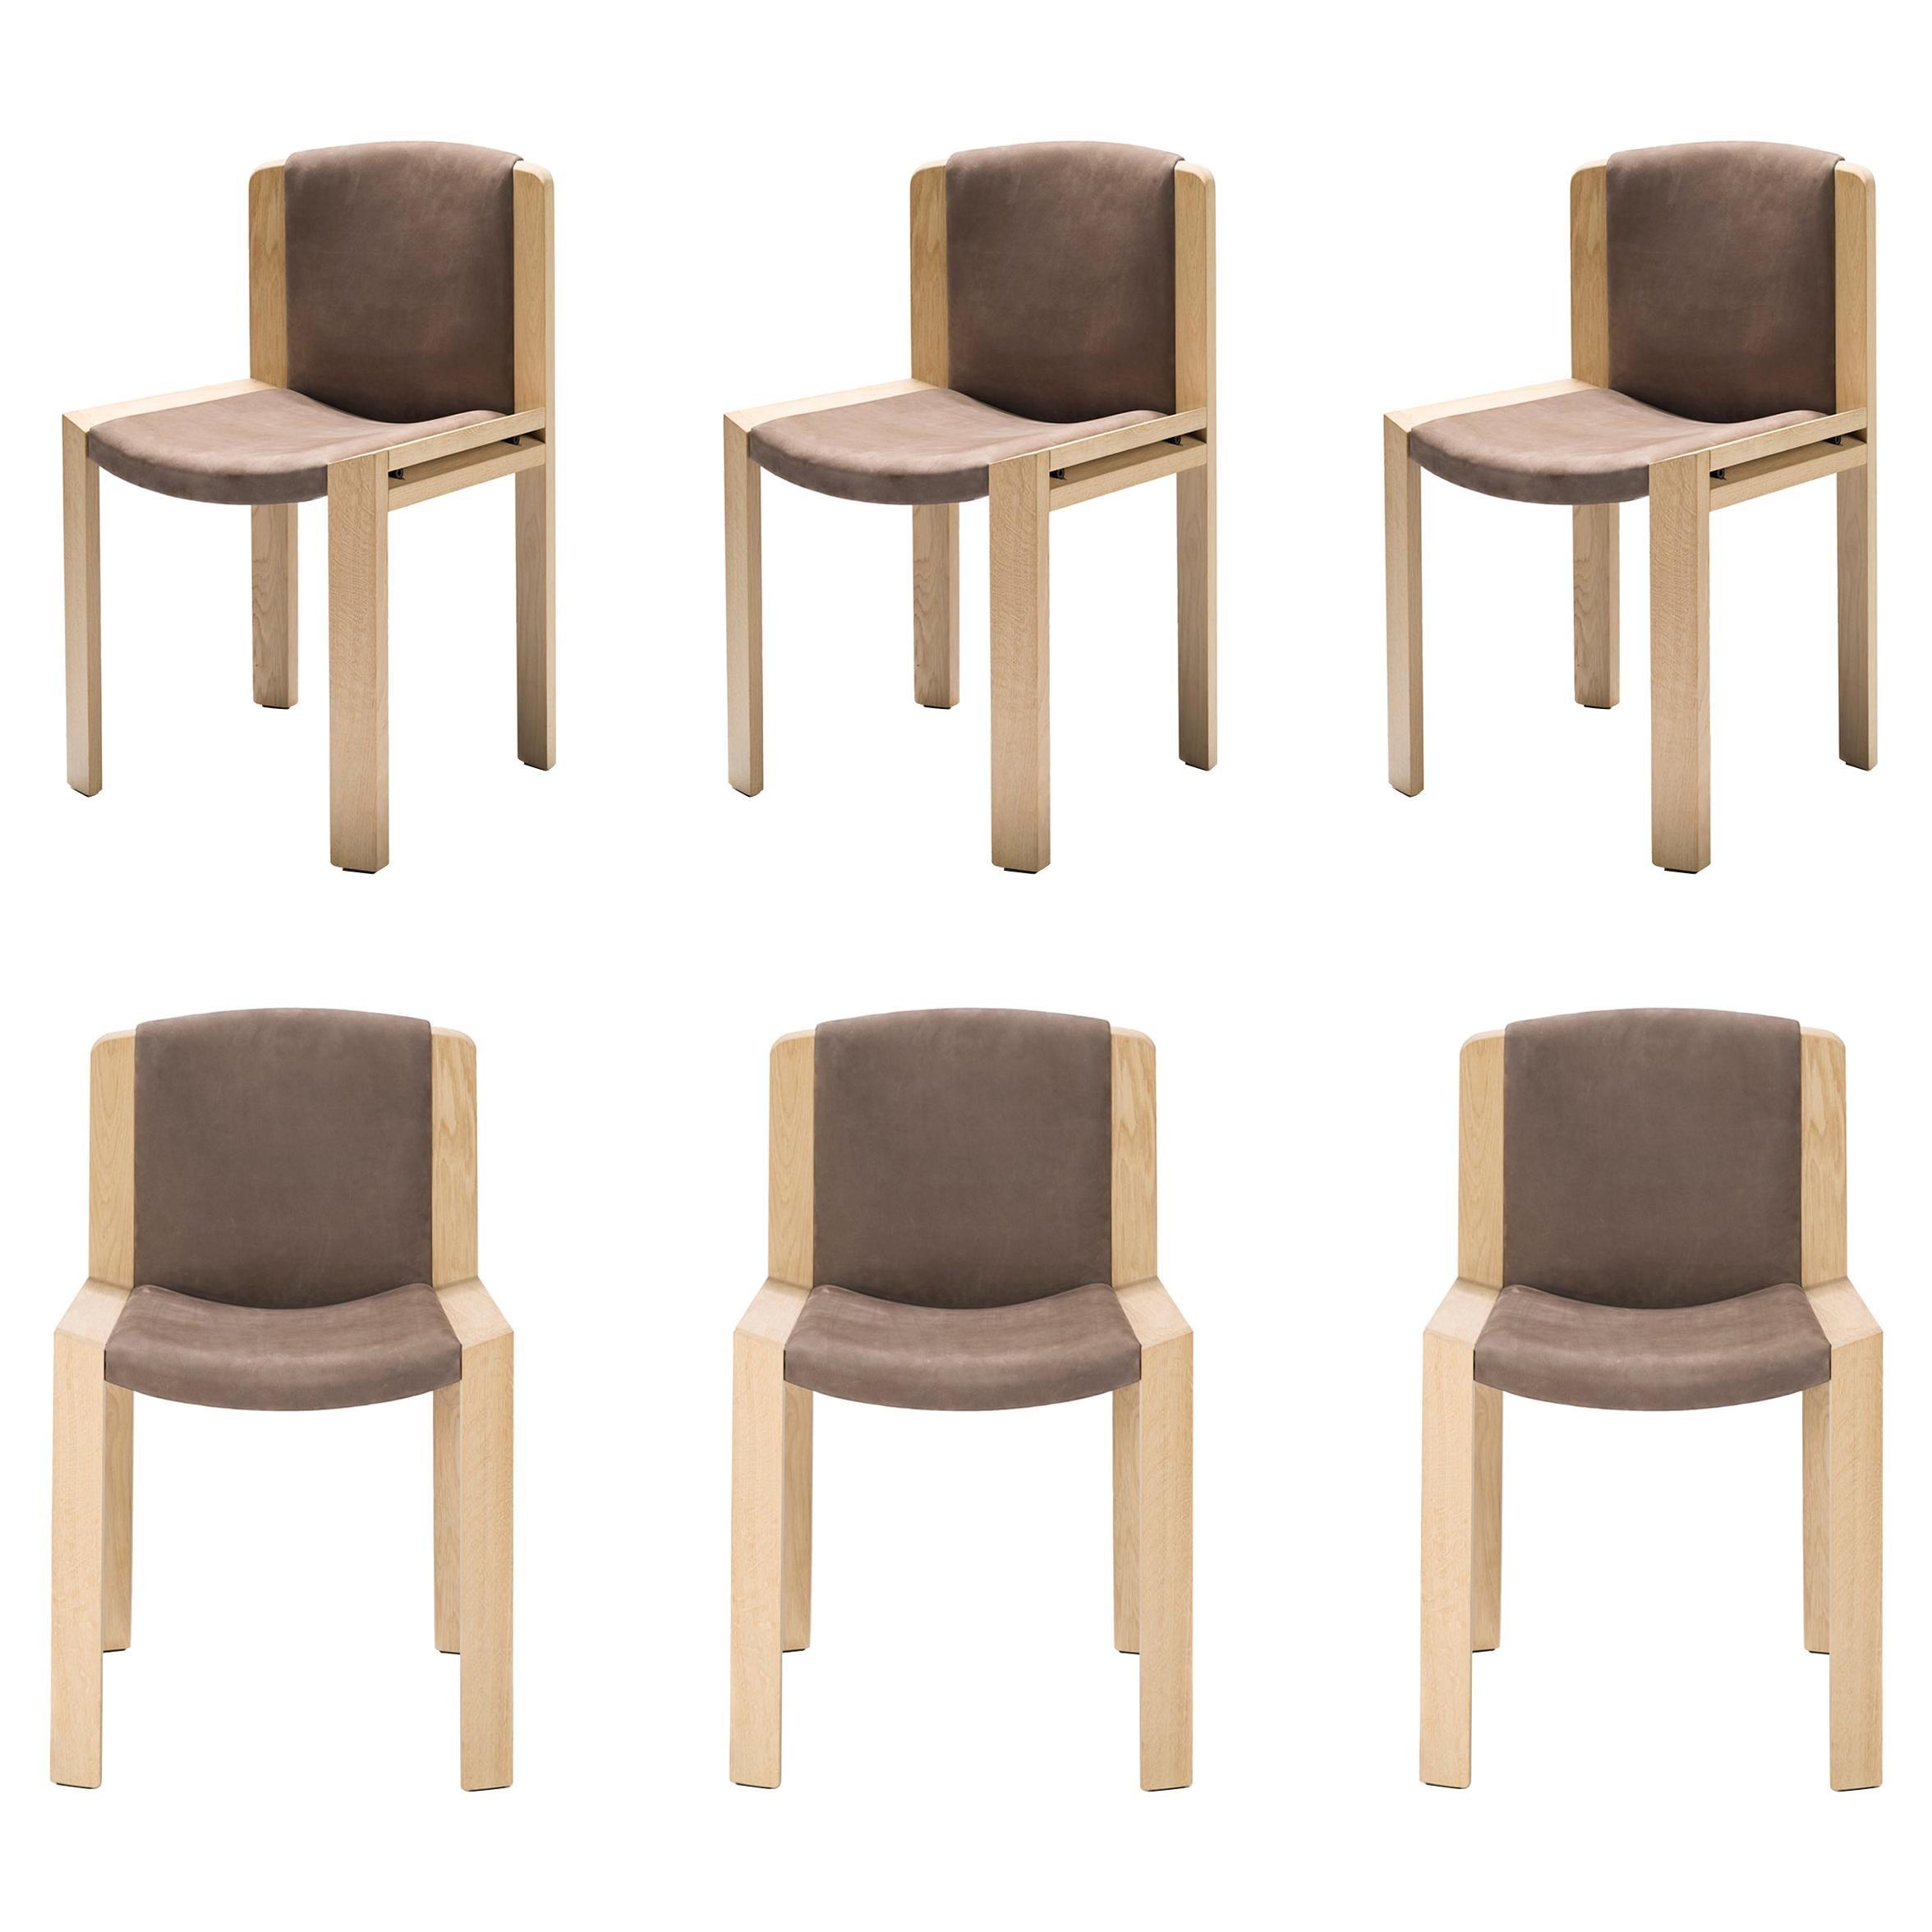 Set of Six Joe Colombo 'Chair 300' by Karakter